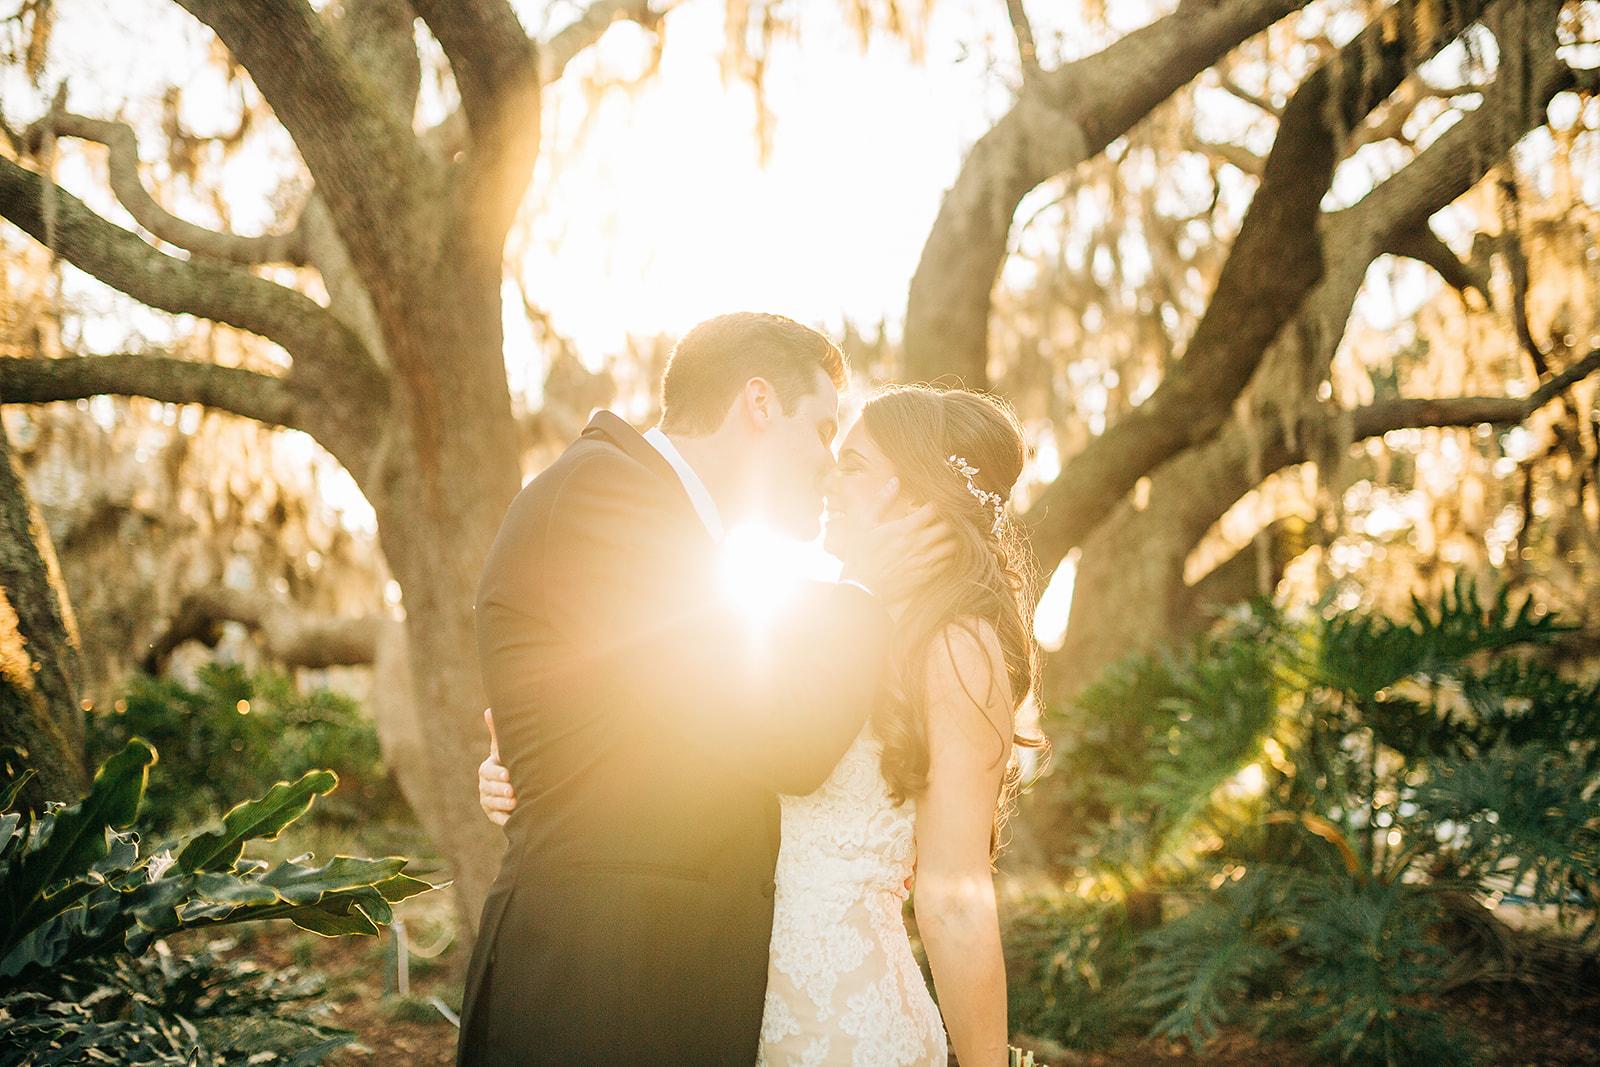 orlando wedding venue - dubsdread catering - couple sunlight